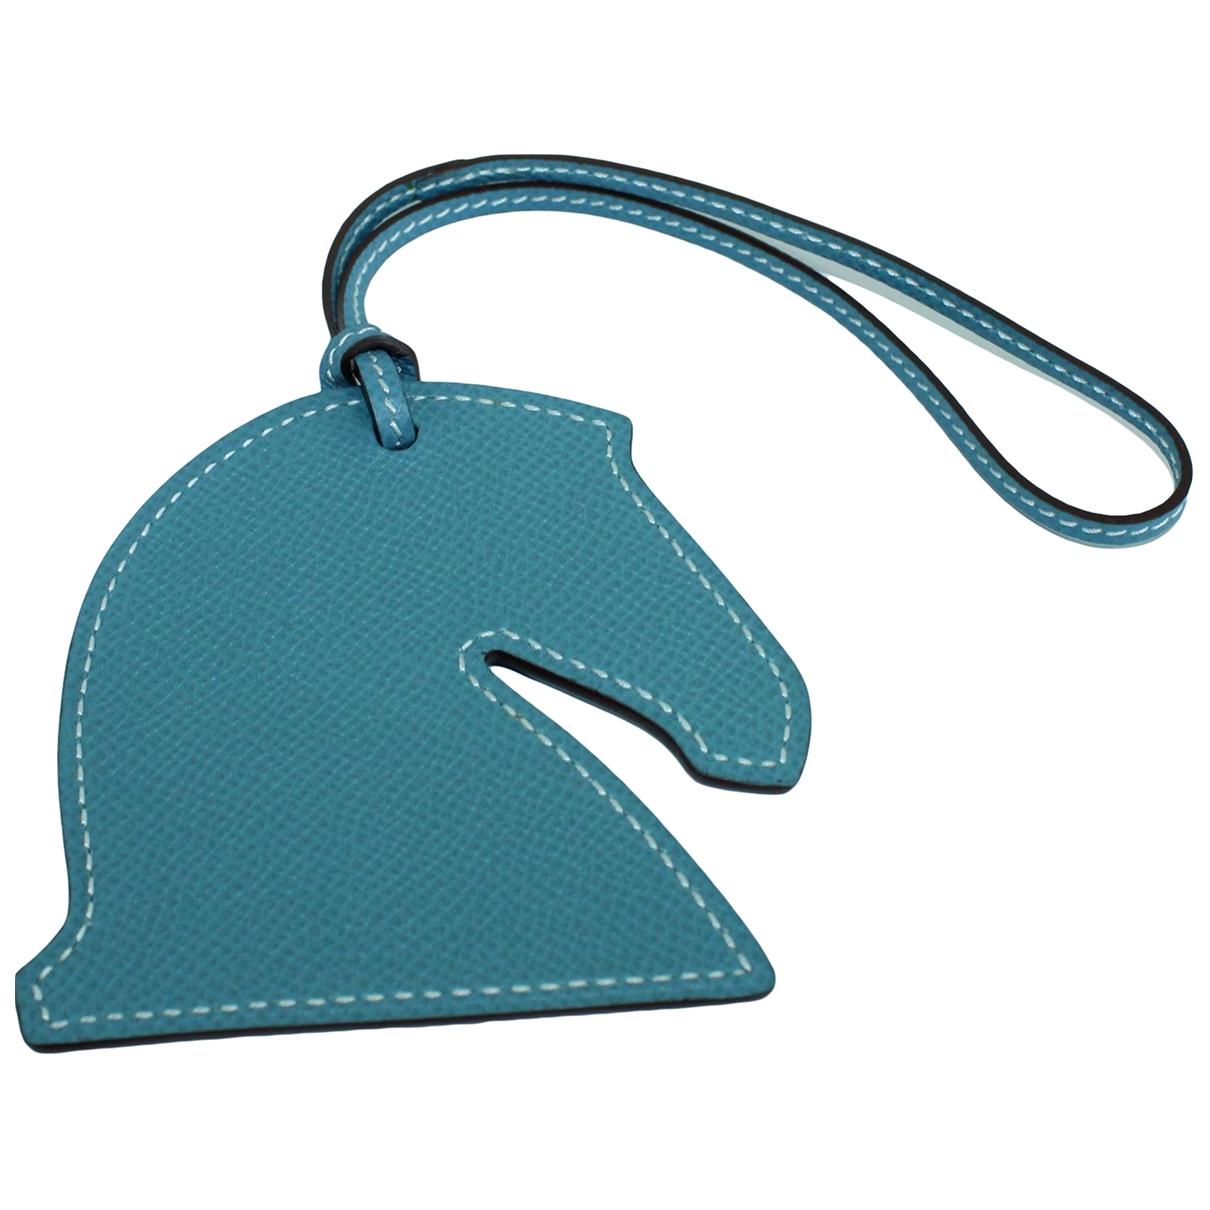 Hermes \N Taschenschmuck in  Blau Leder